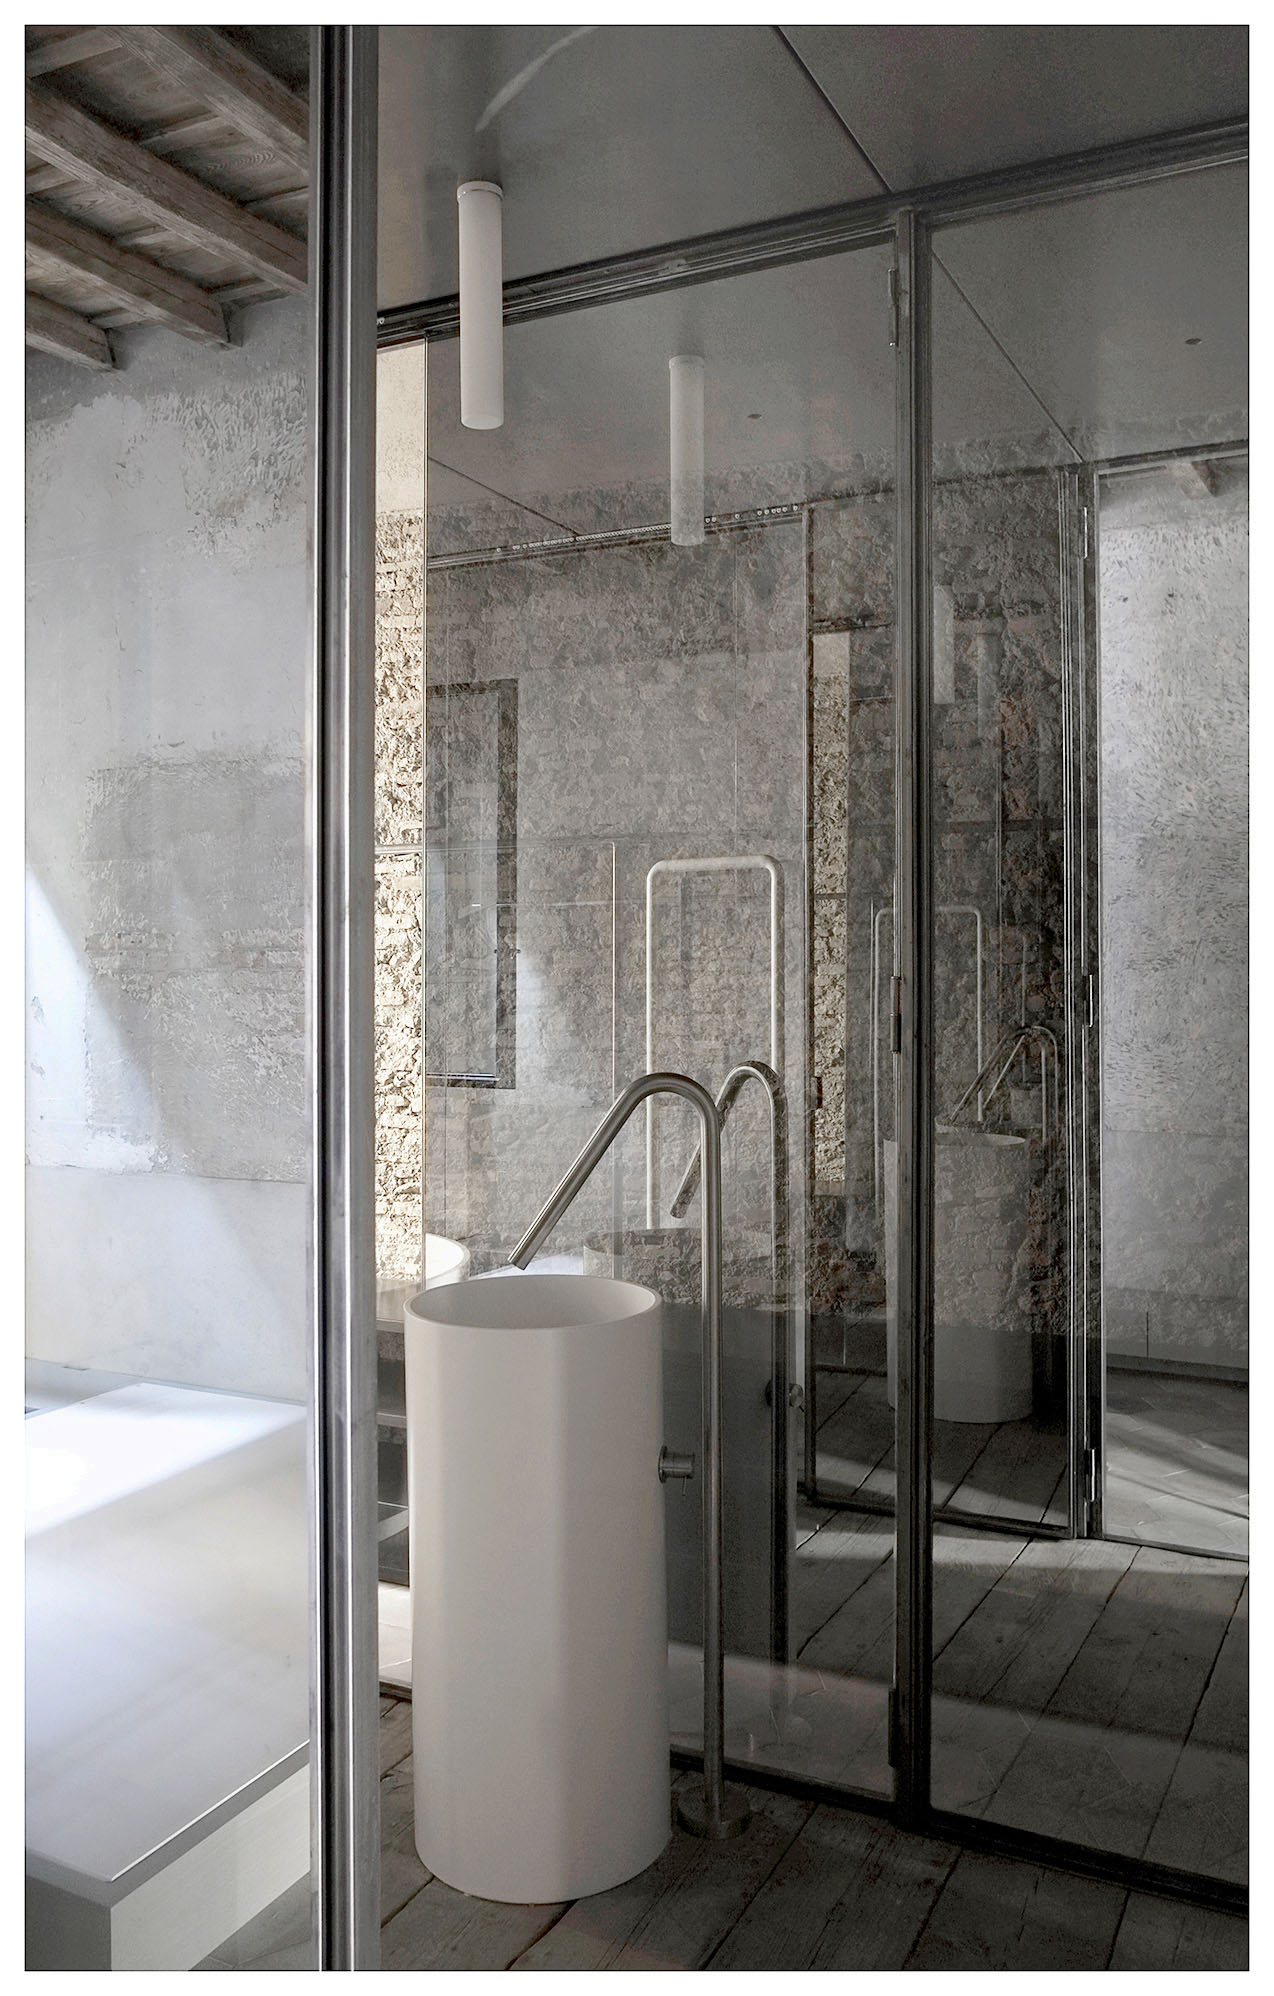 Vanity basin in main bathroom.